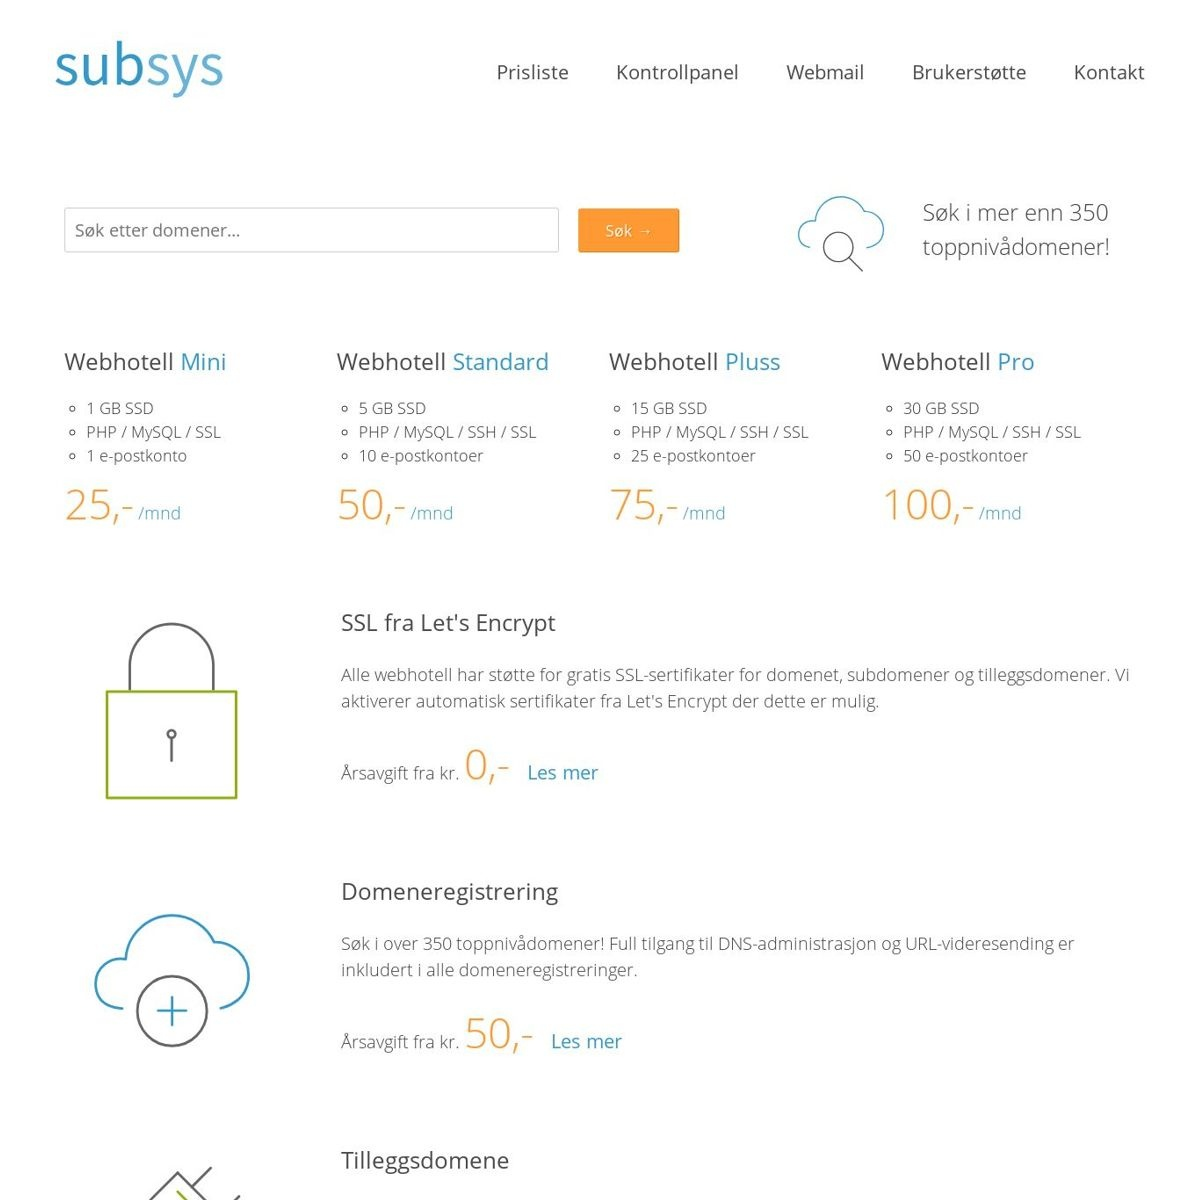 Subsys Coupon - Free Printable Spiriva Coupons